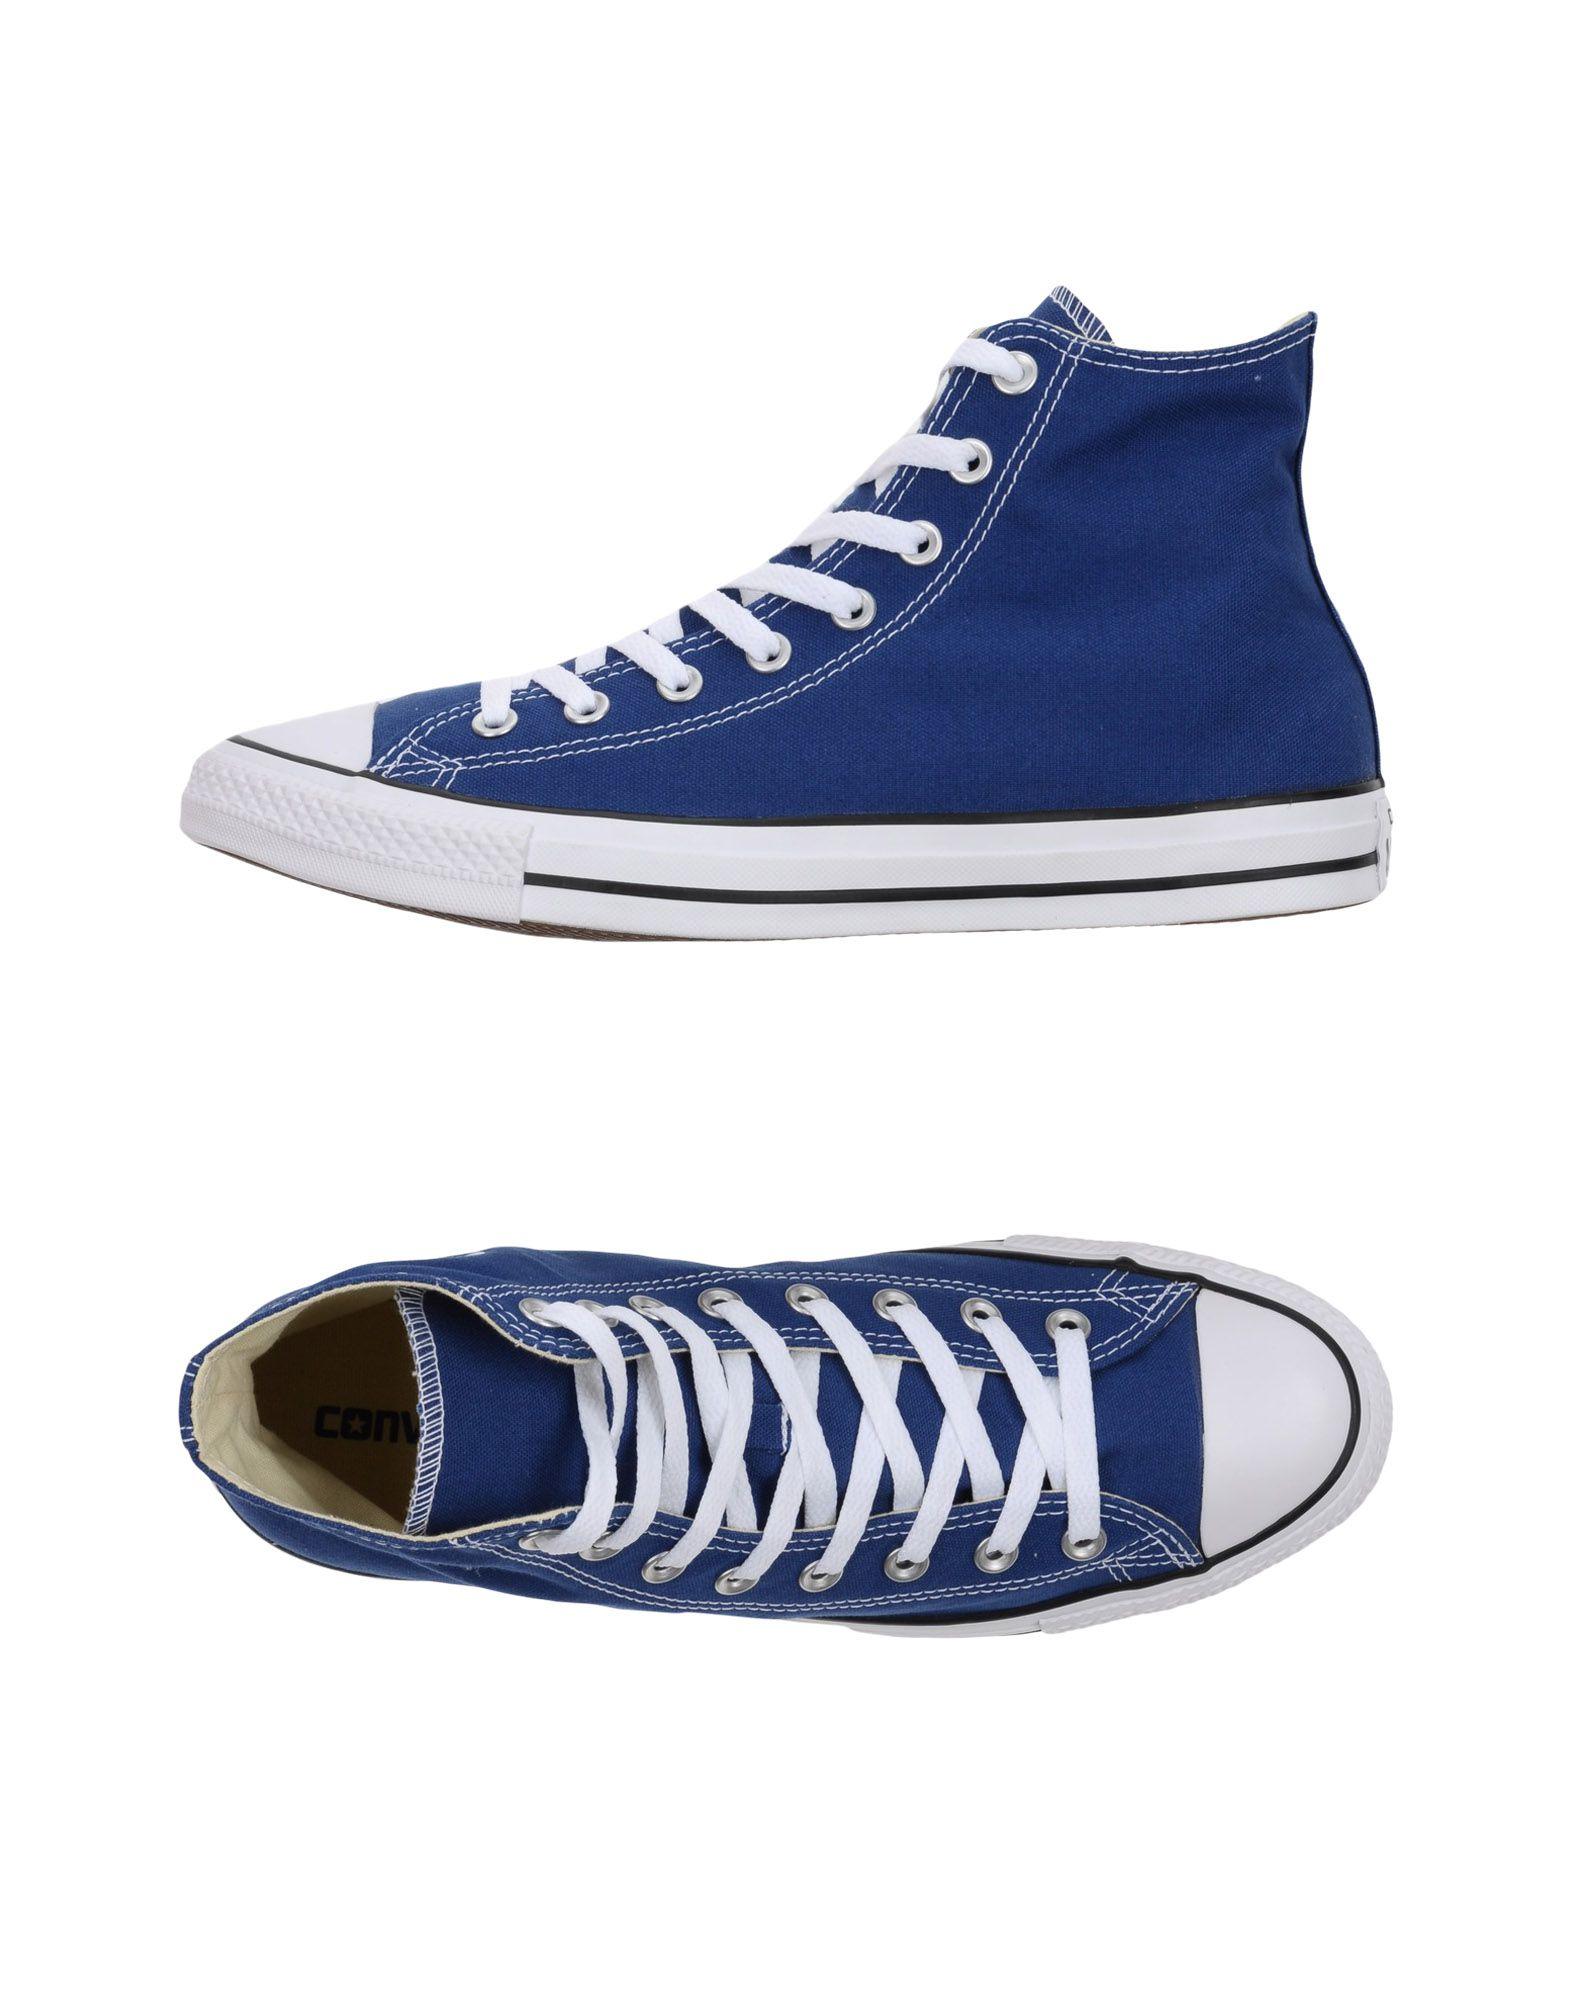 Scarpe da Ginnastica Converse - All Star Uomo - Converse 11361514CC 503589